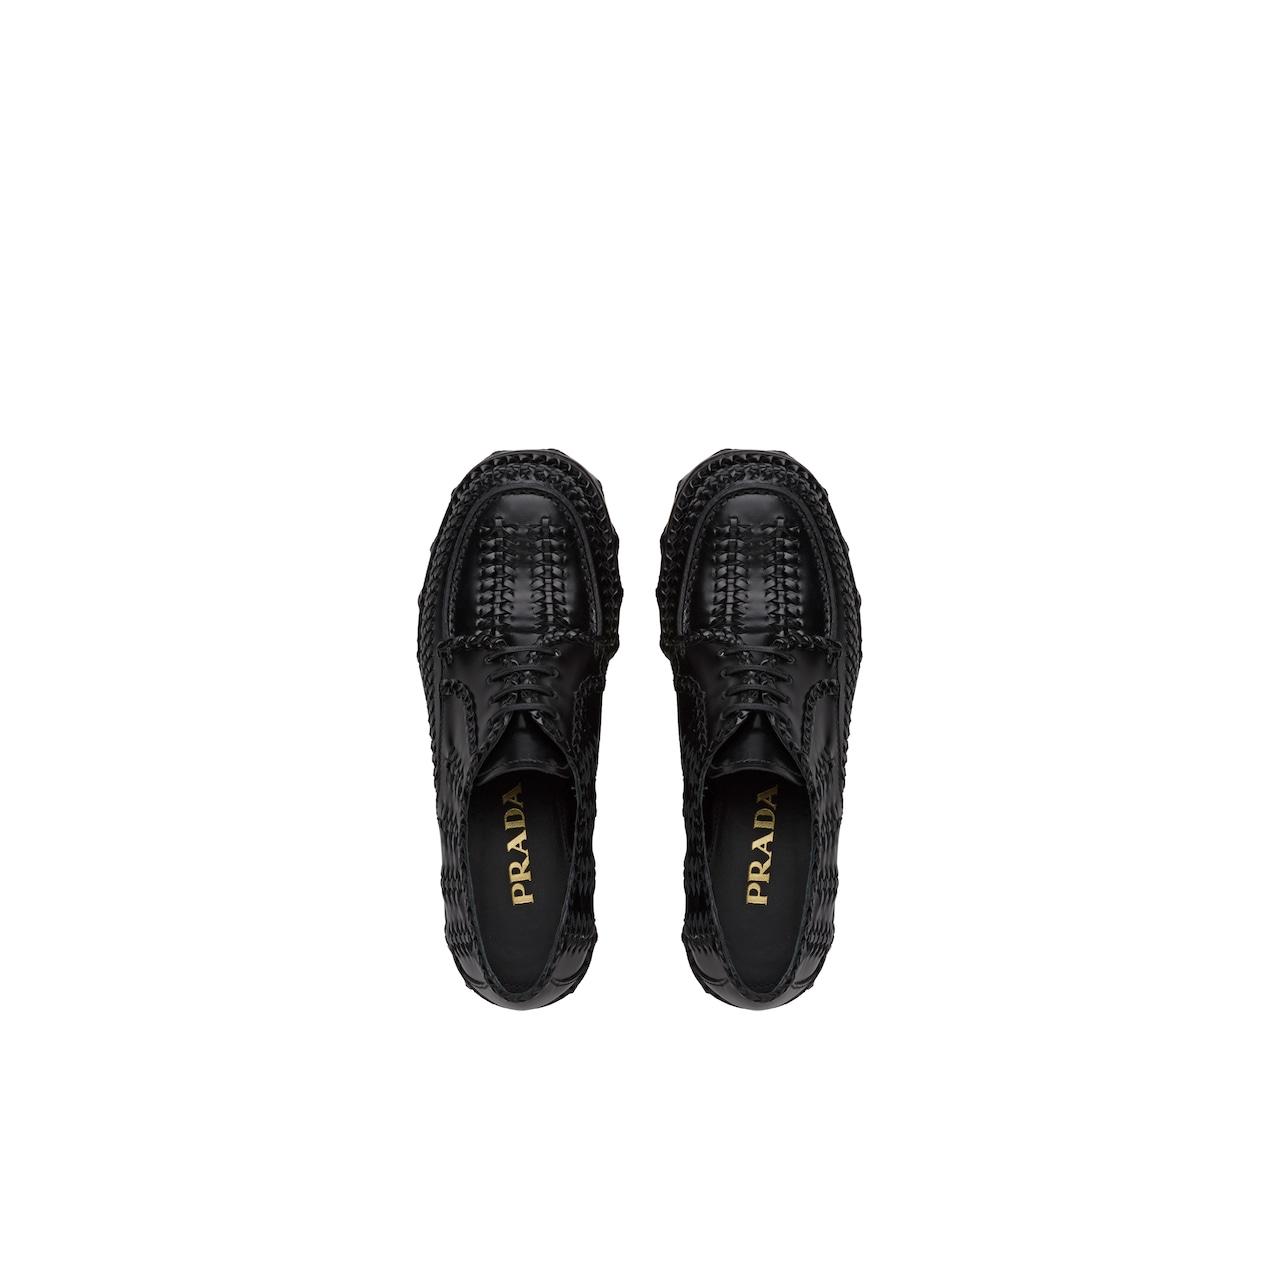 Prada 亮面皮革系带鞋 4